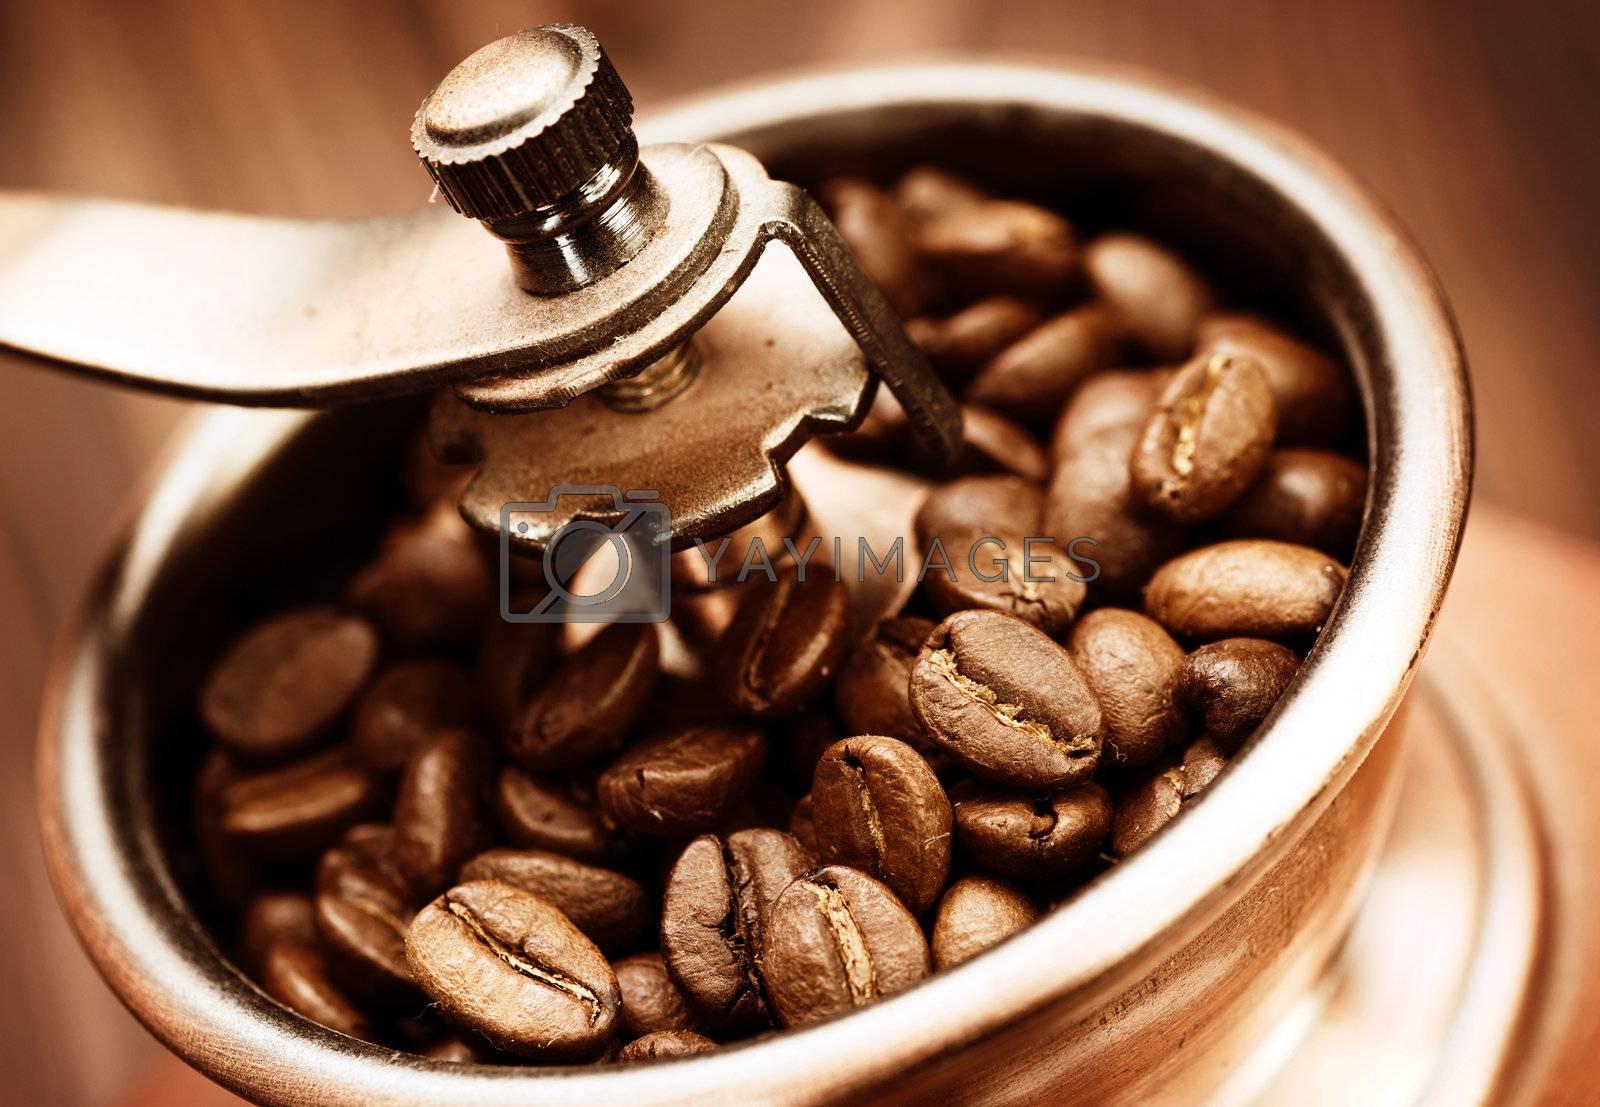 Coffee Mill by Subbotina Anna